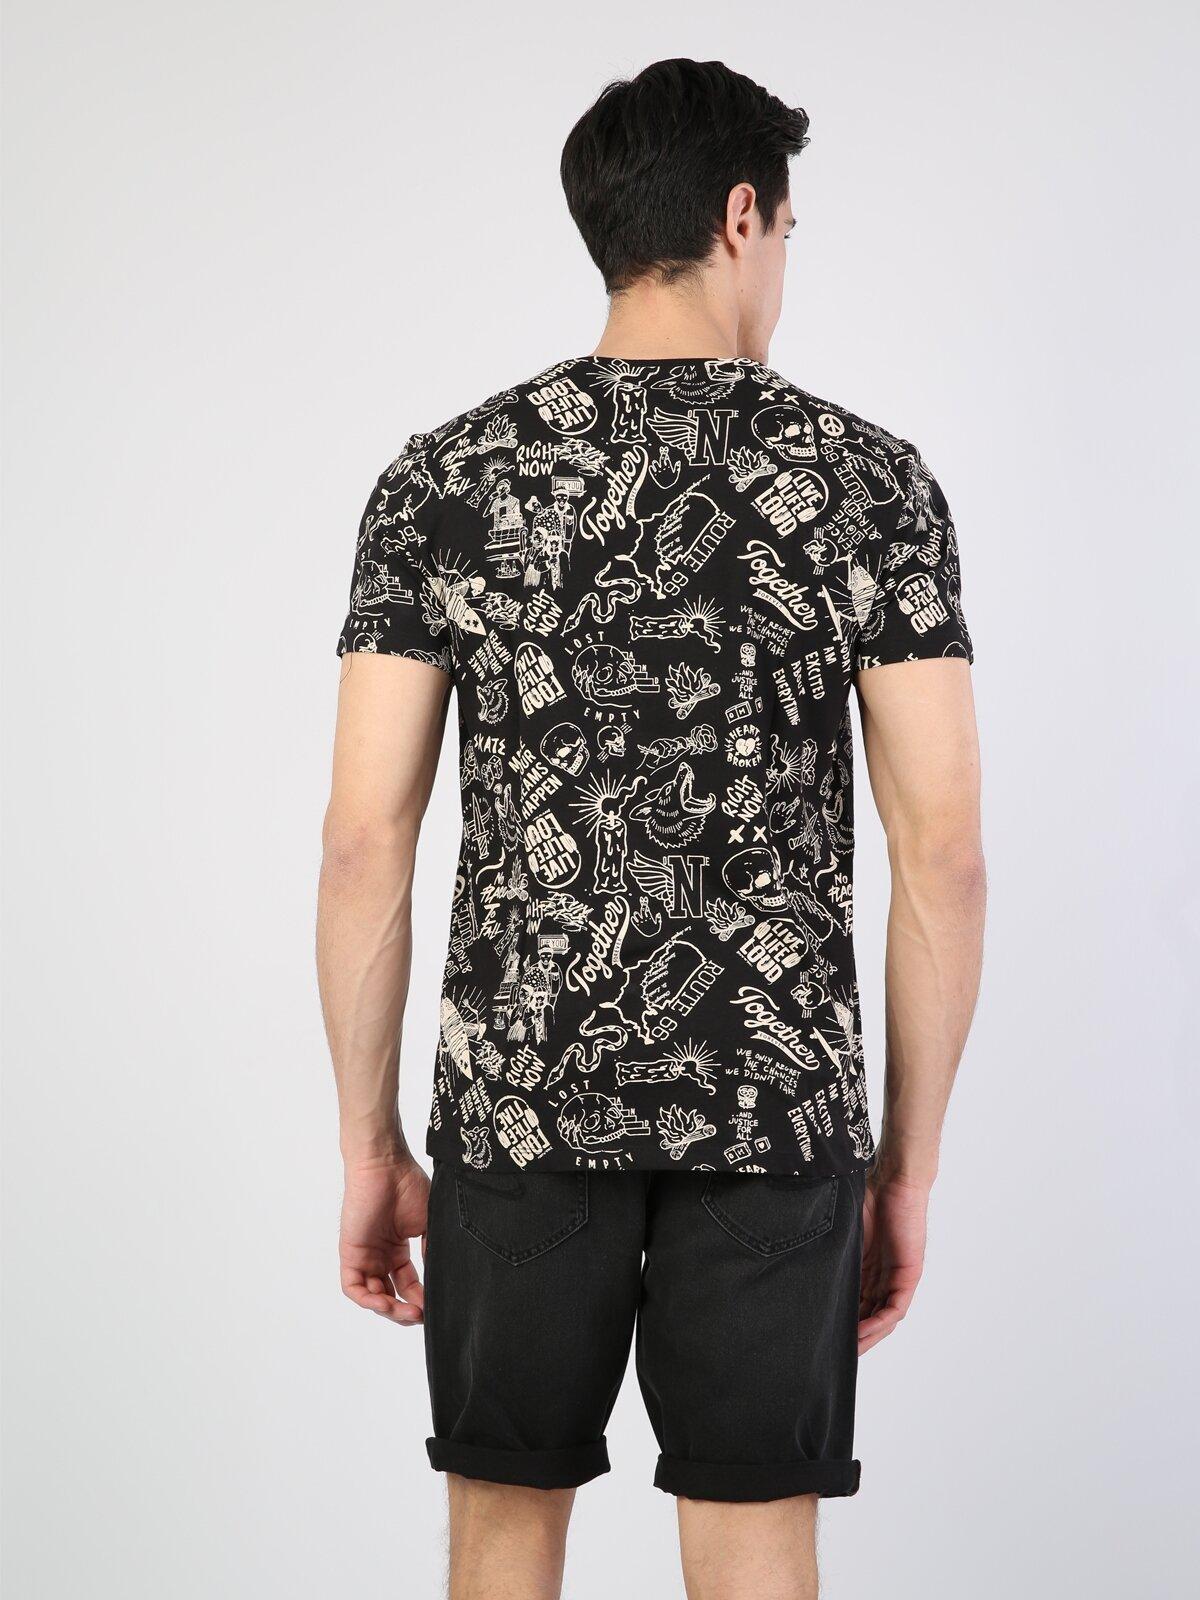 Siyah Yuvarlak Yaka Kısa Kol Tişört